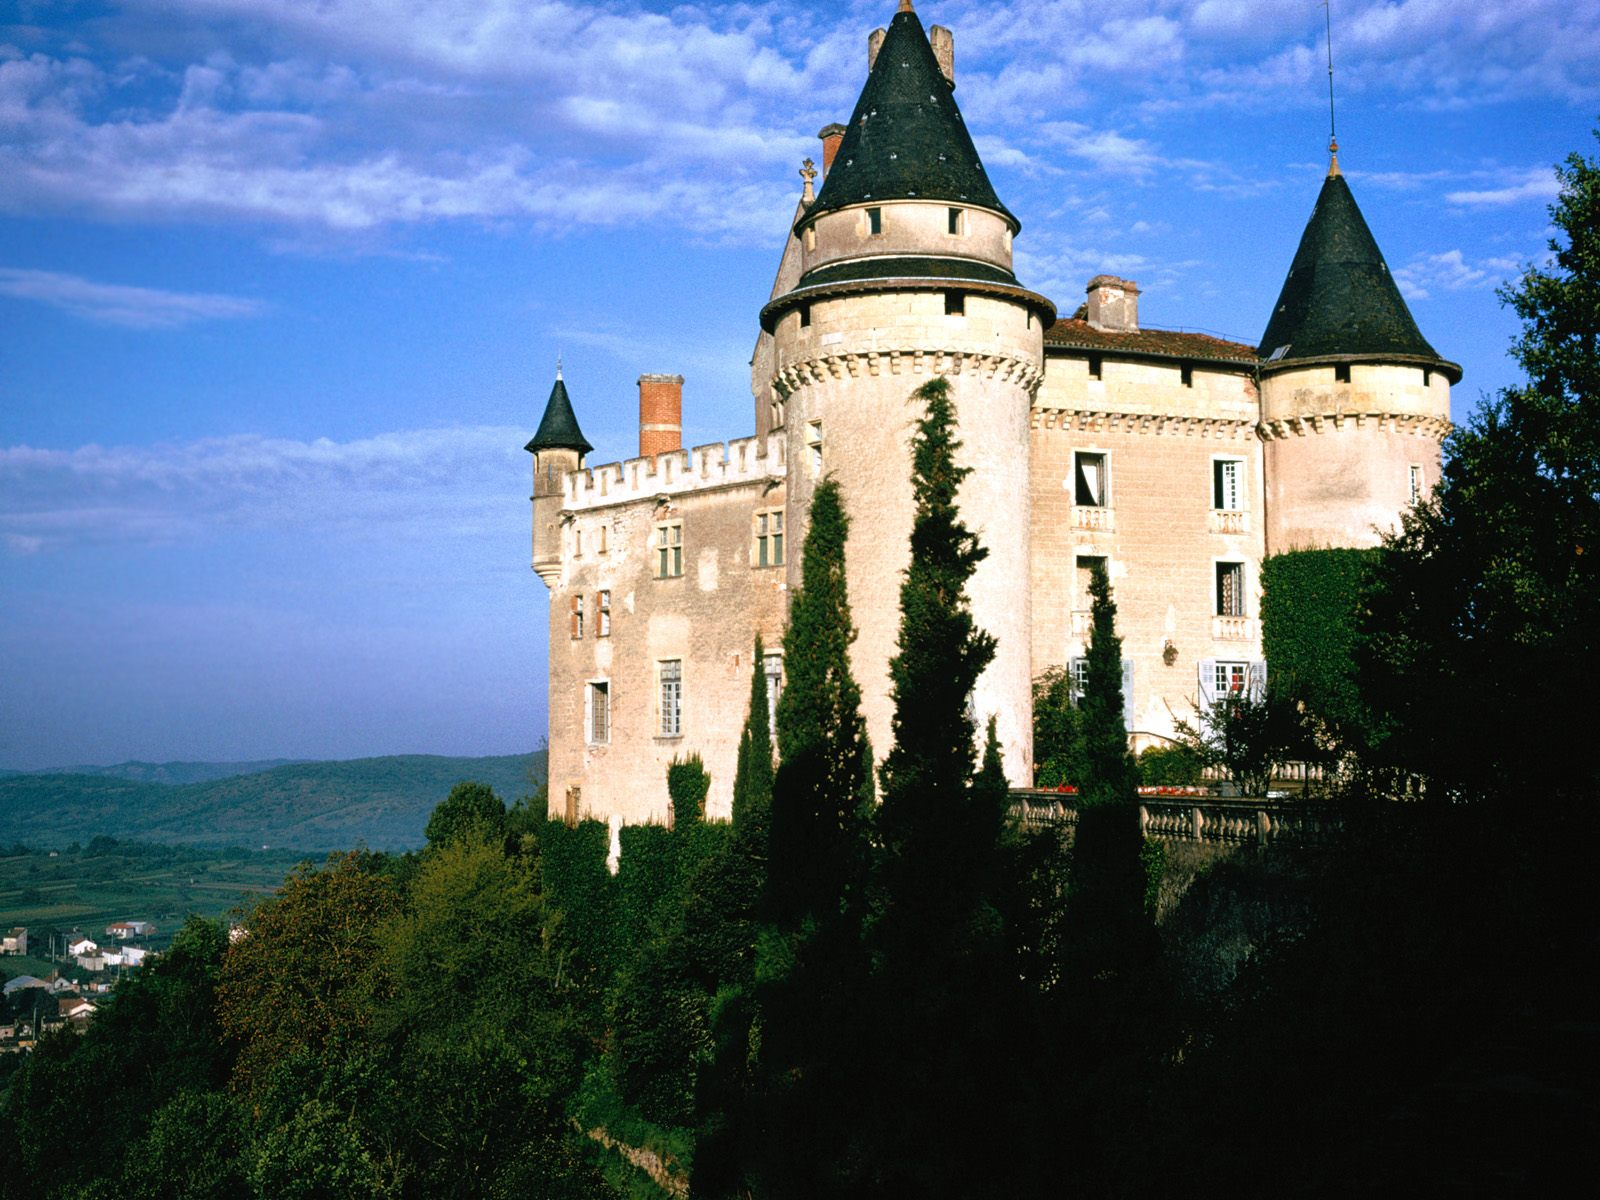 castle wallpaper nice france - photo #16